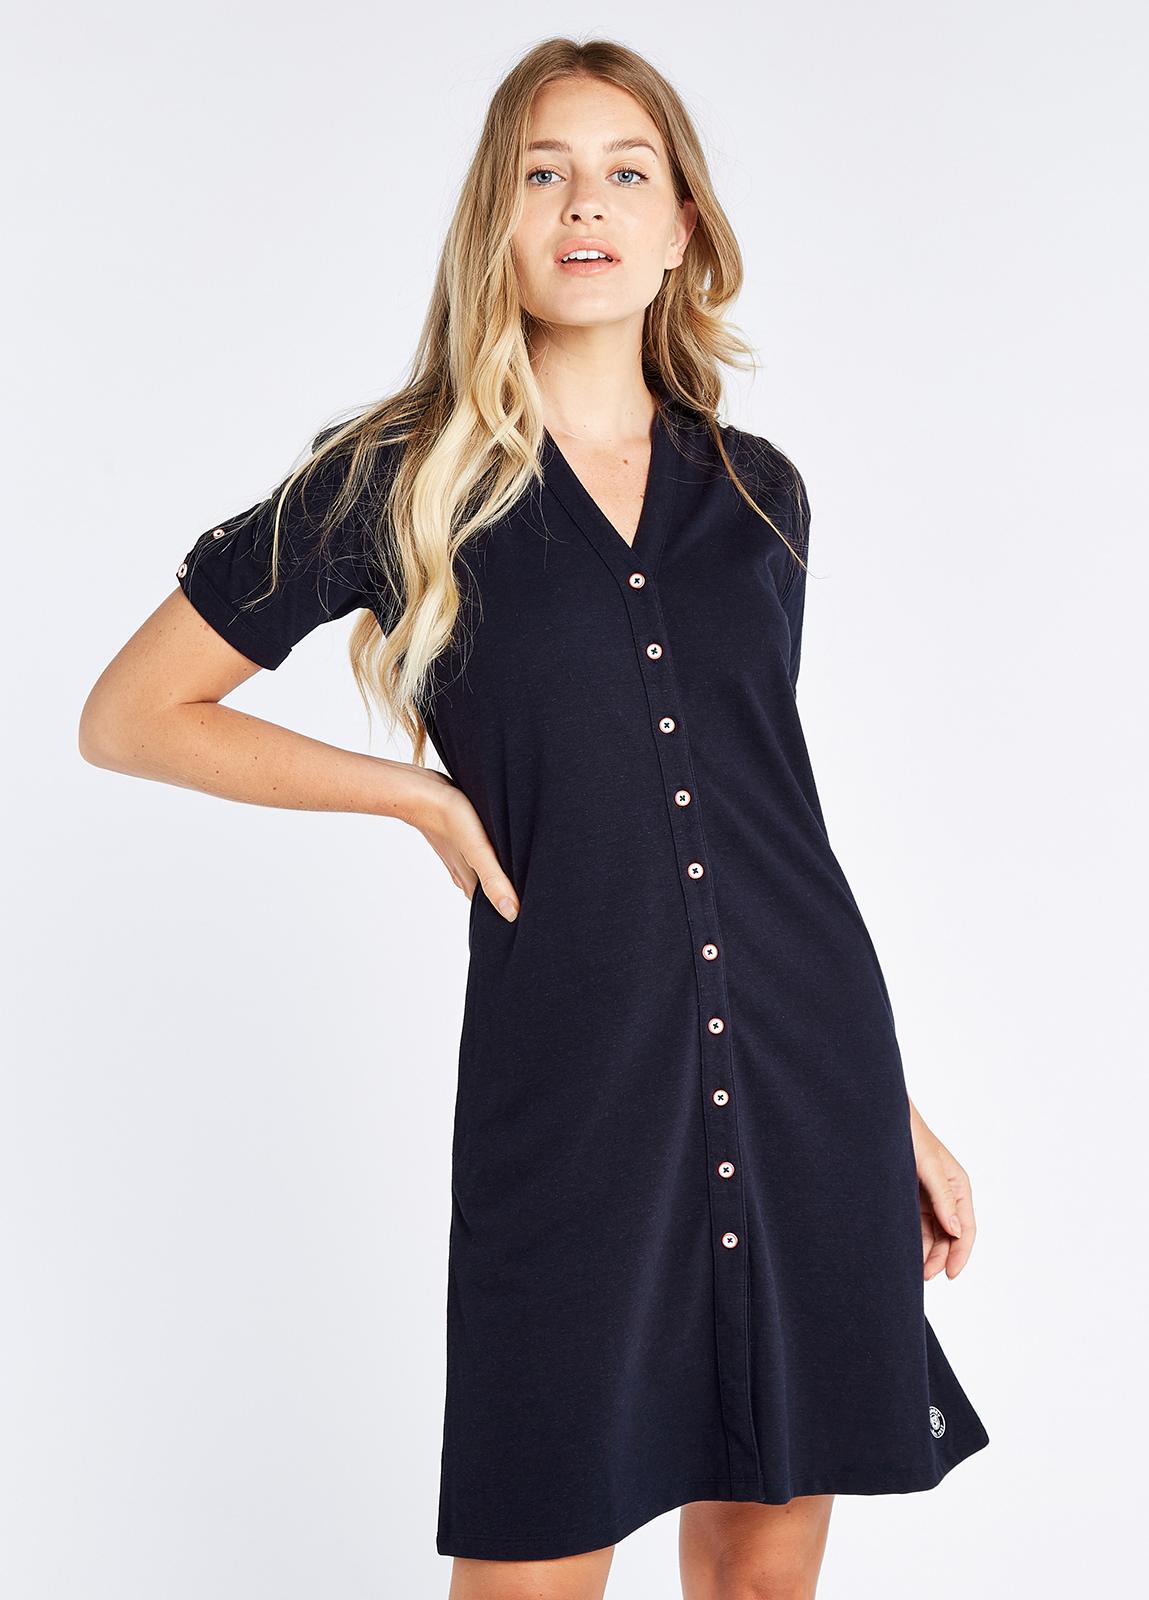 Druid Shirt Dress - Navy